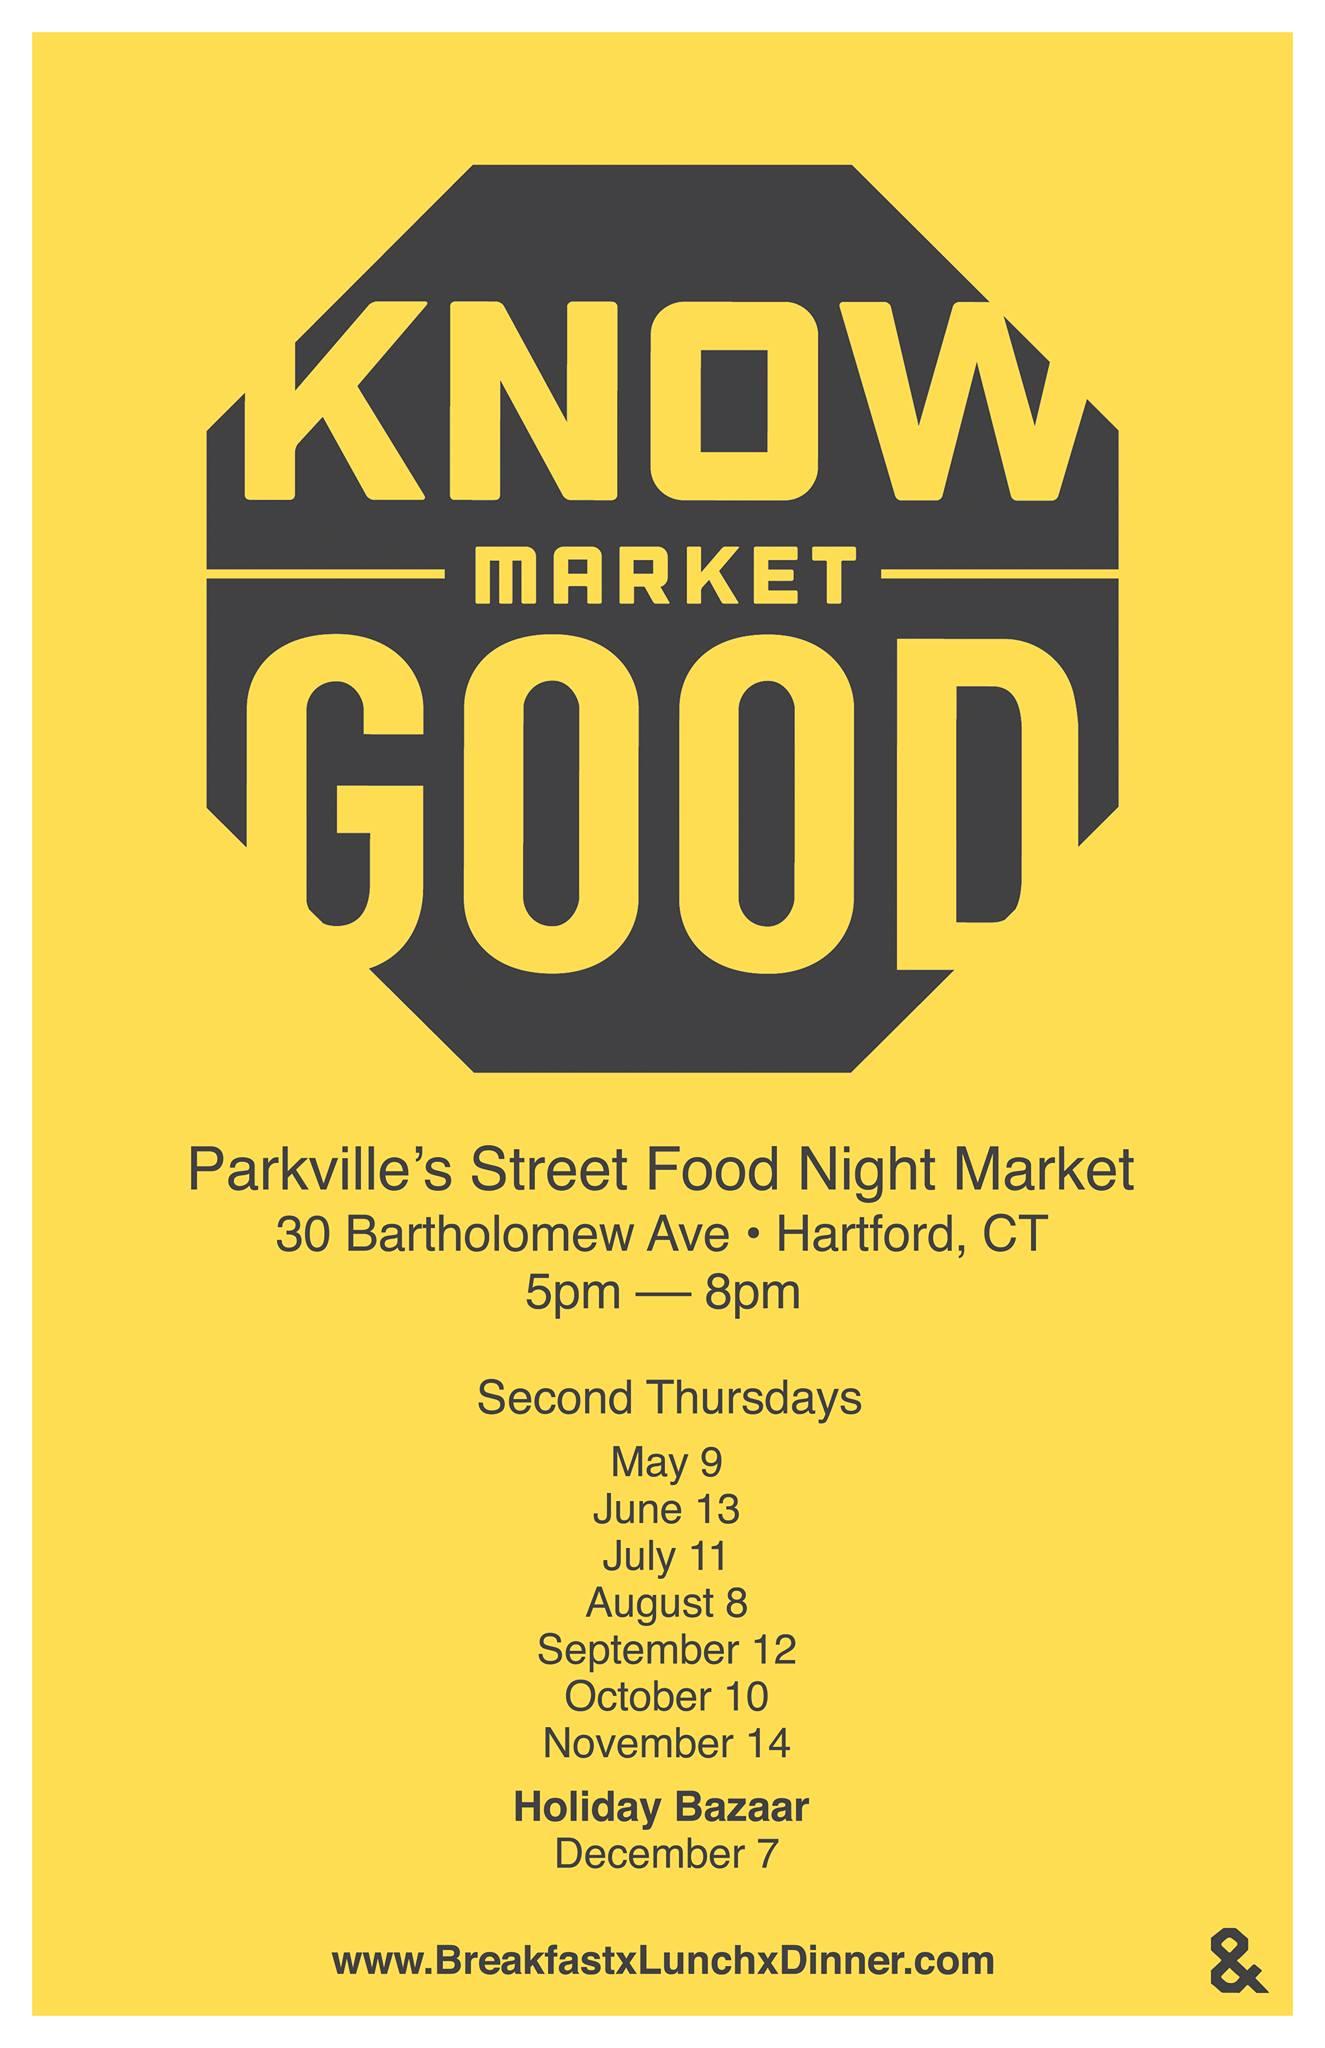 know+good+market+hartford.jpeg